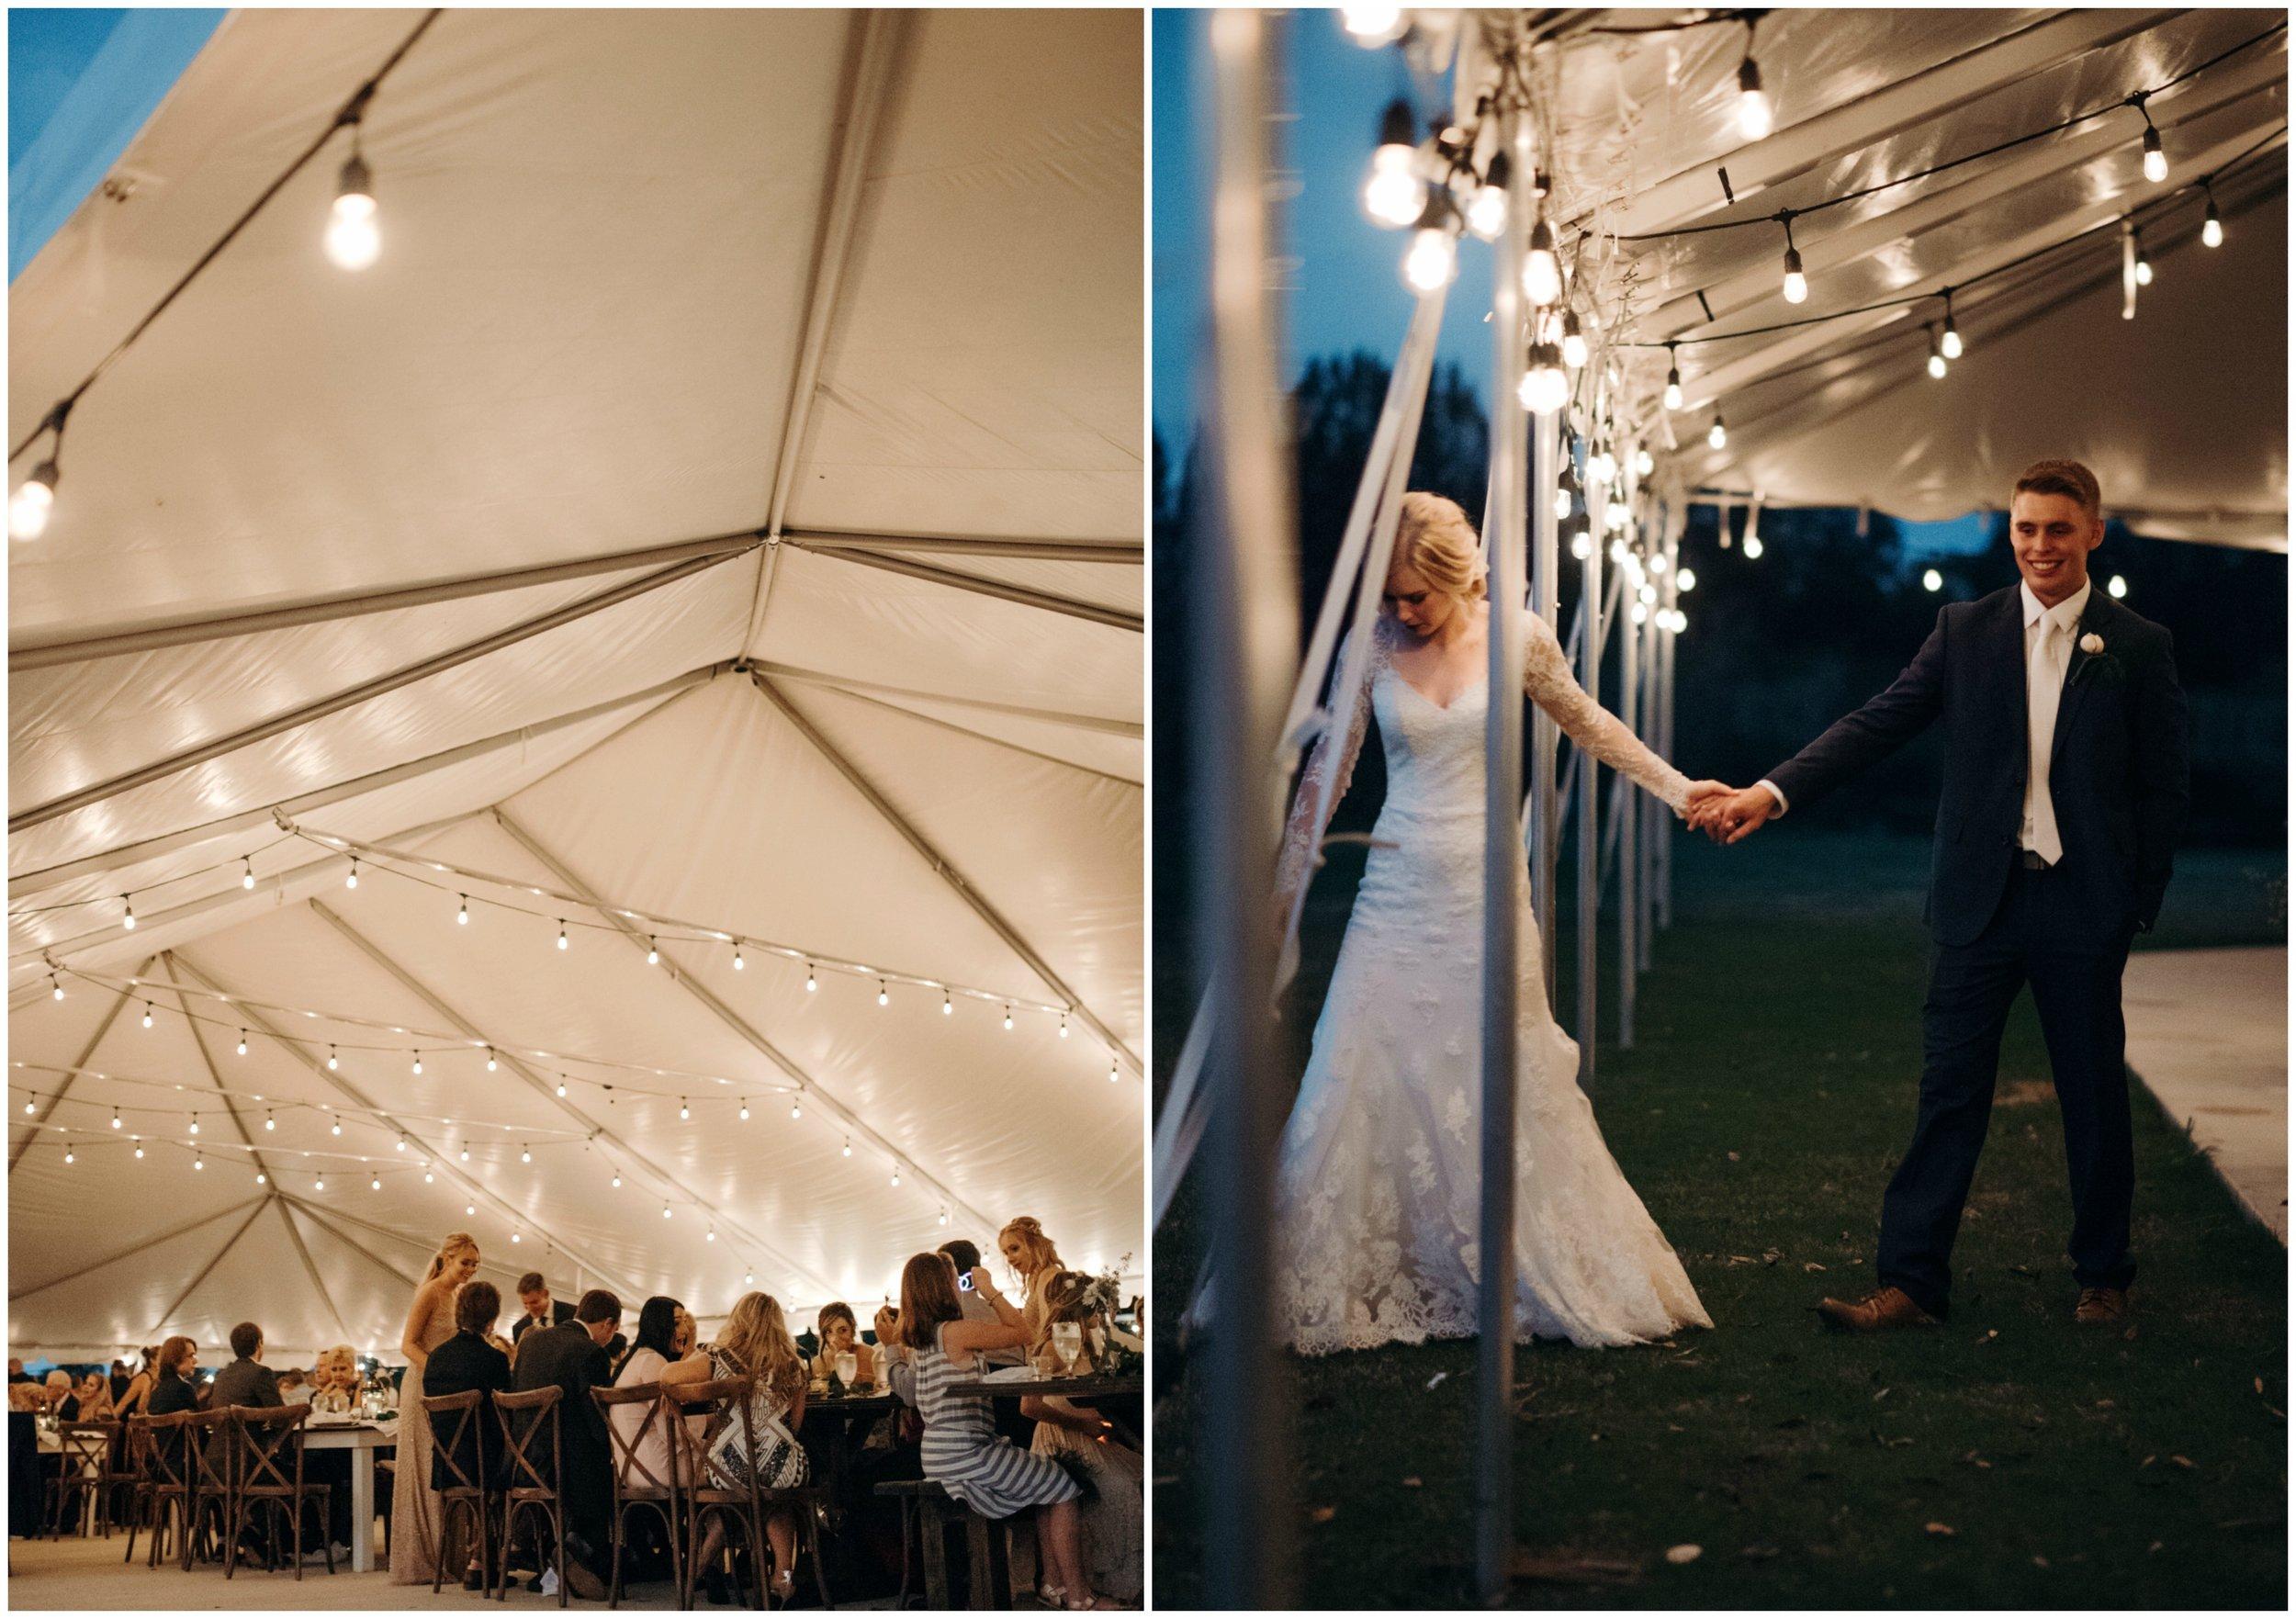 micayla-greyson-wedding-blue-hour-tent.jpg